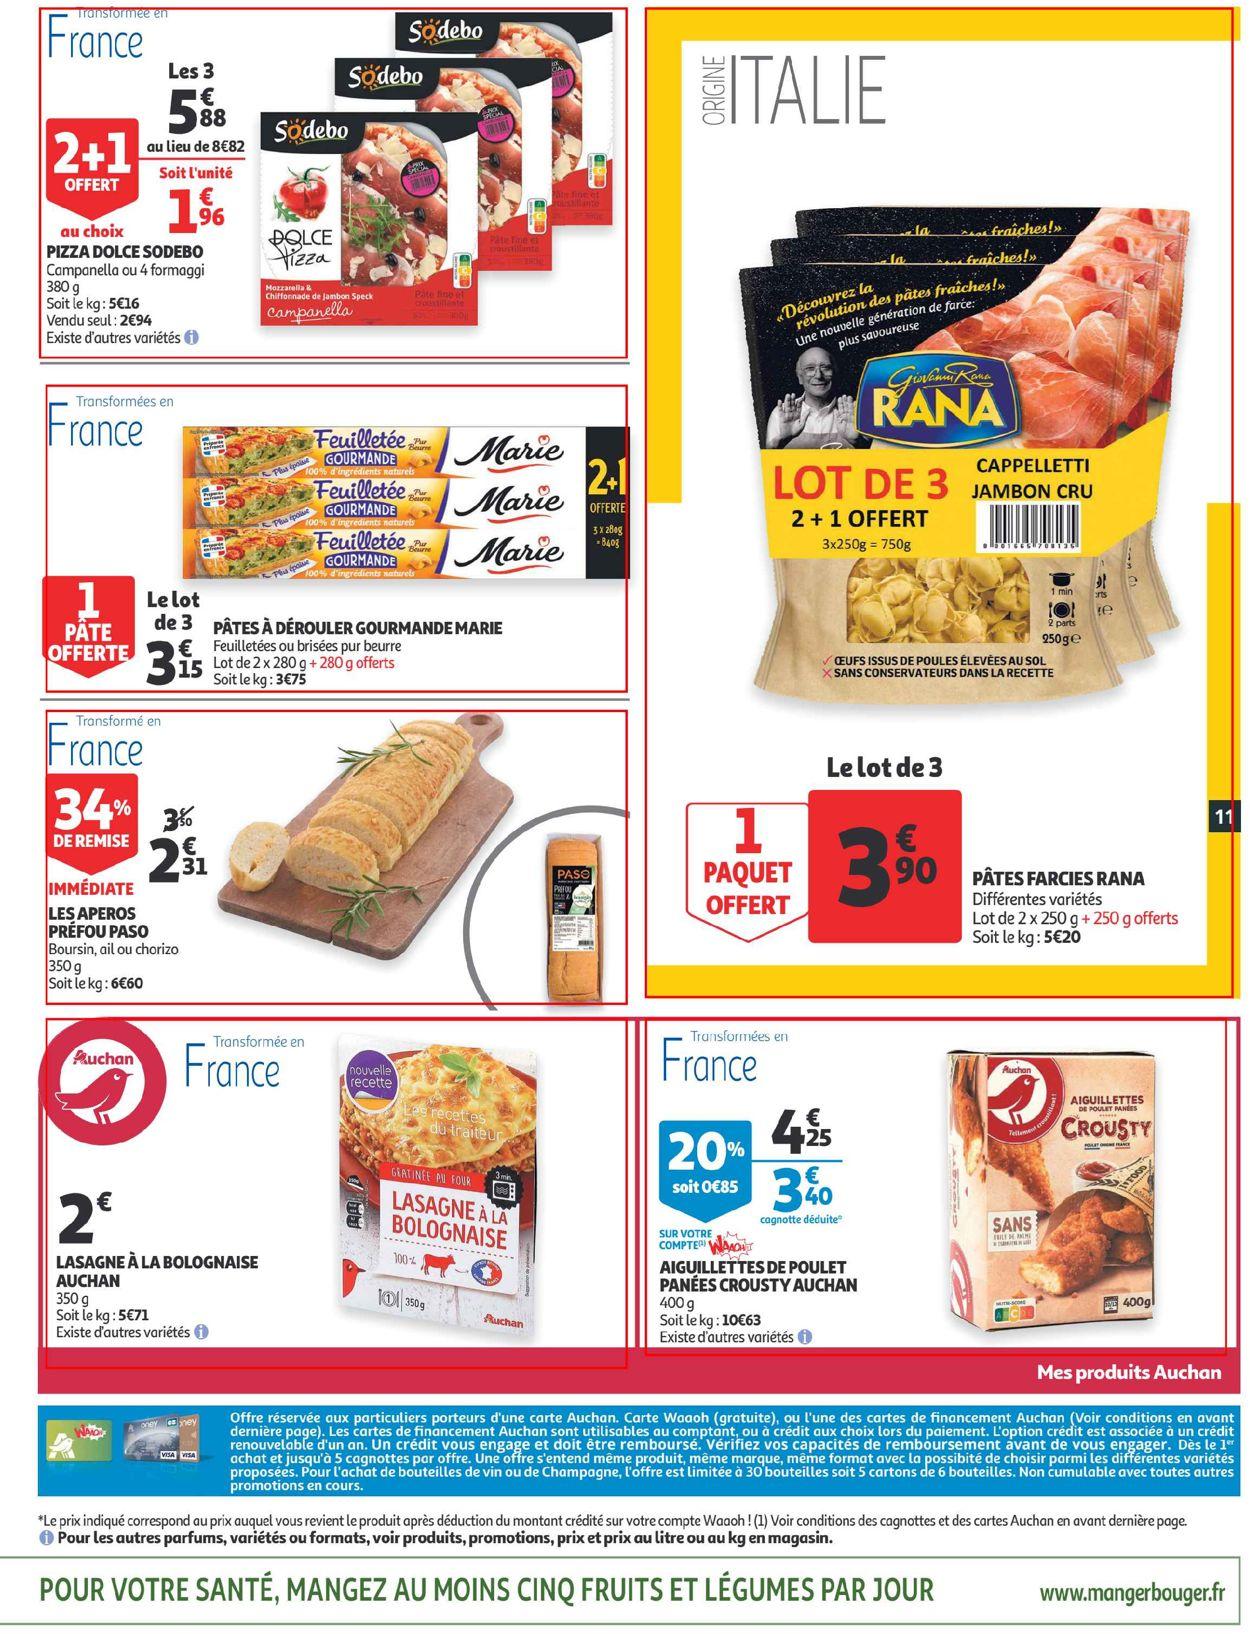 Auchan Catalogue - 15.07-21.07.2020 (Page 11)